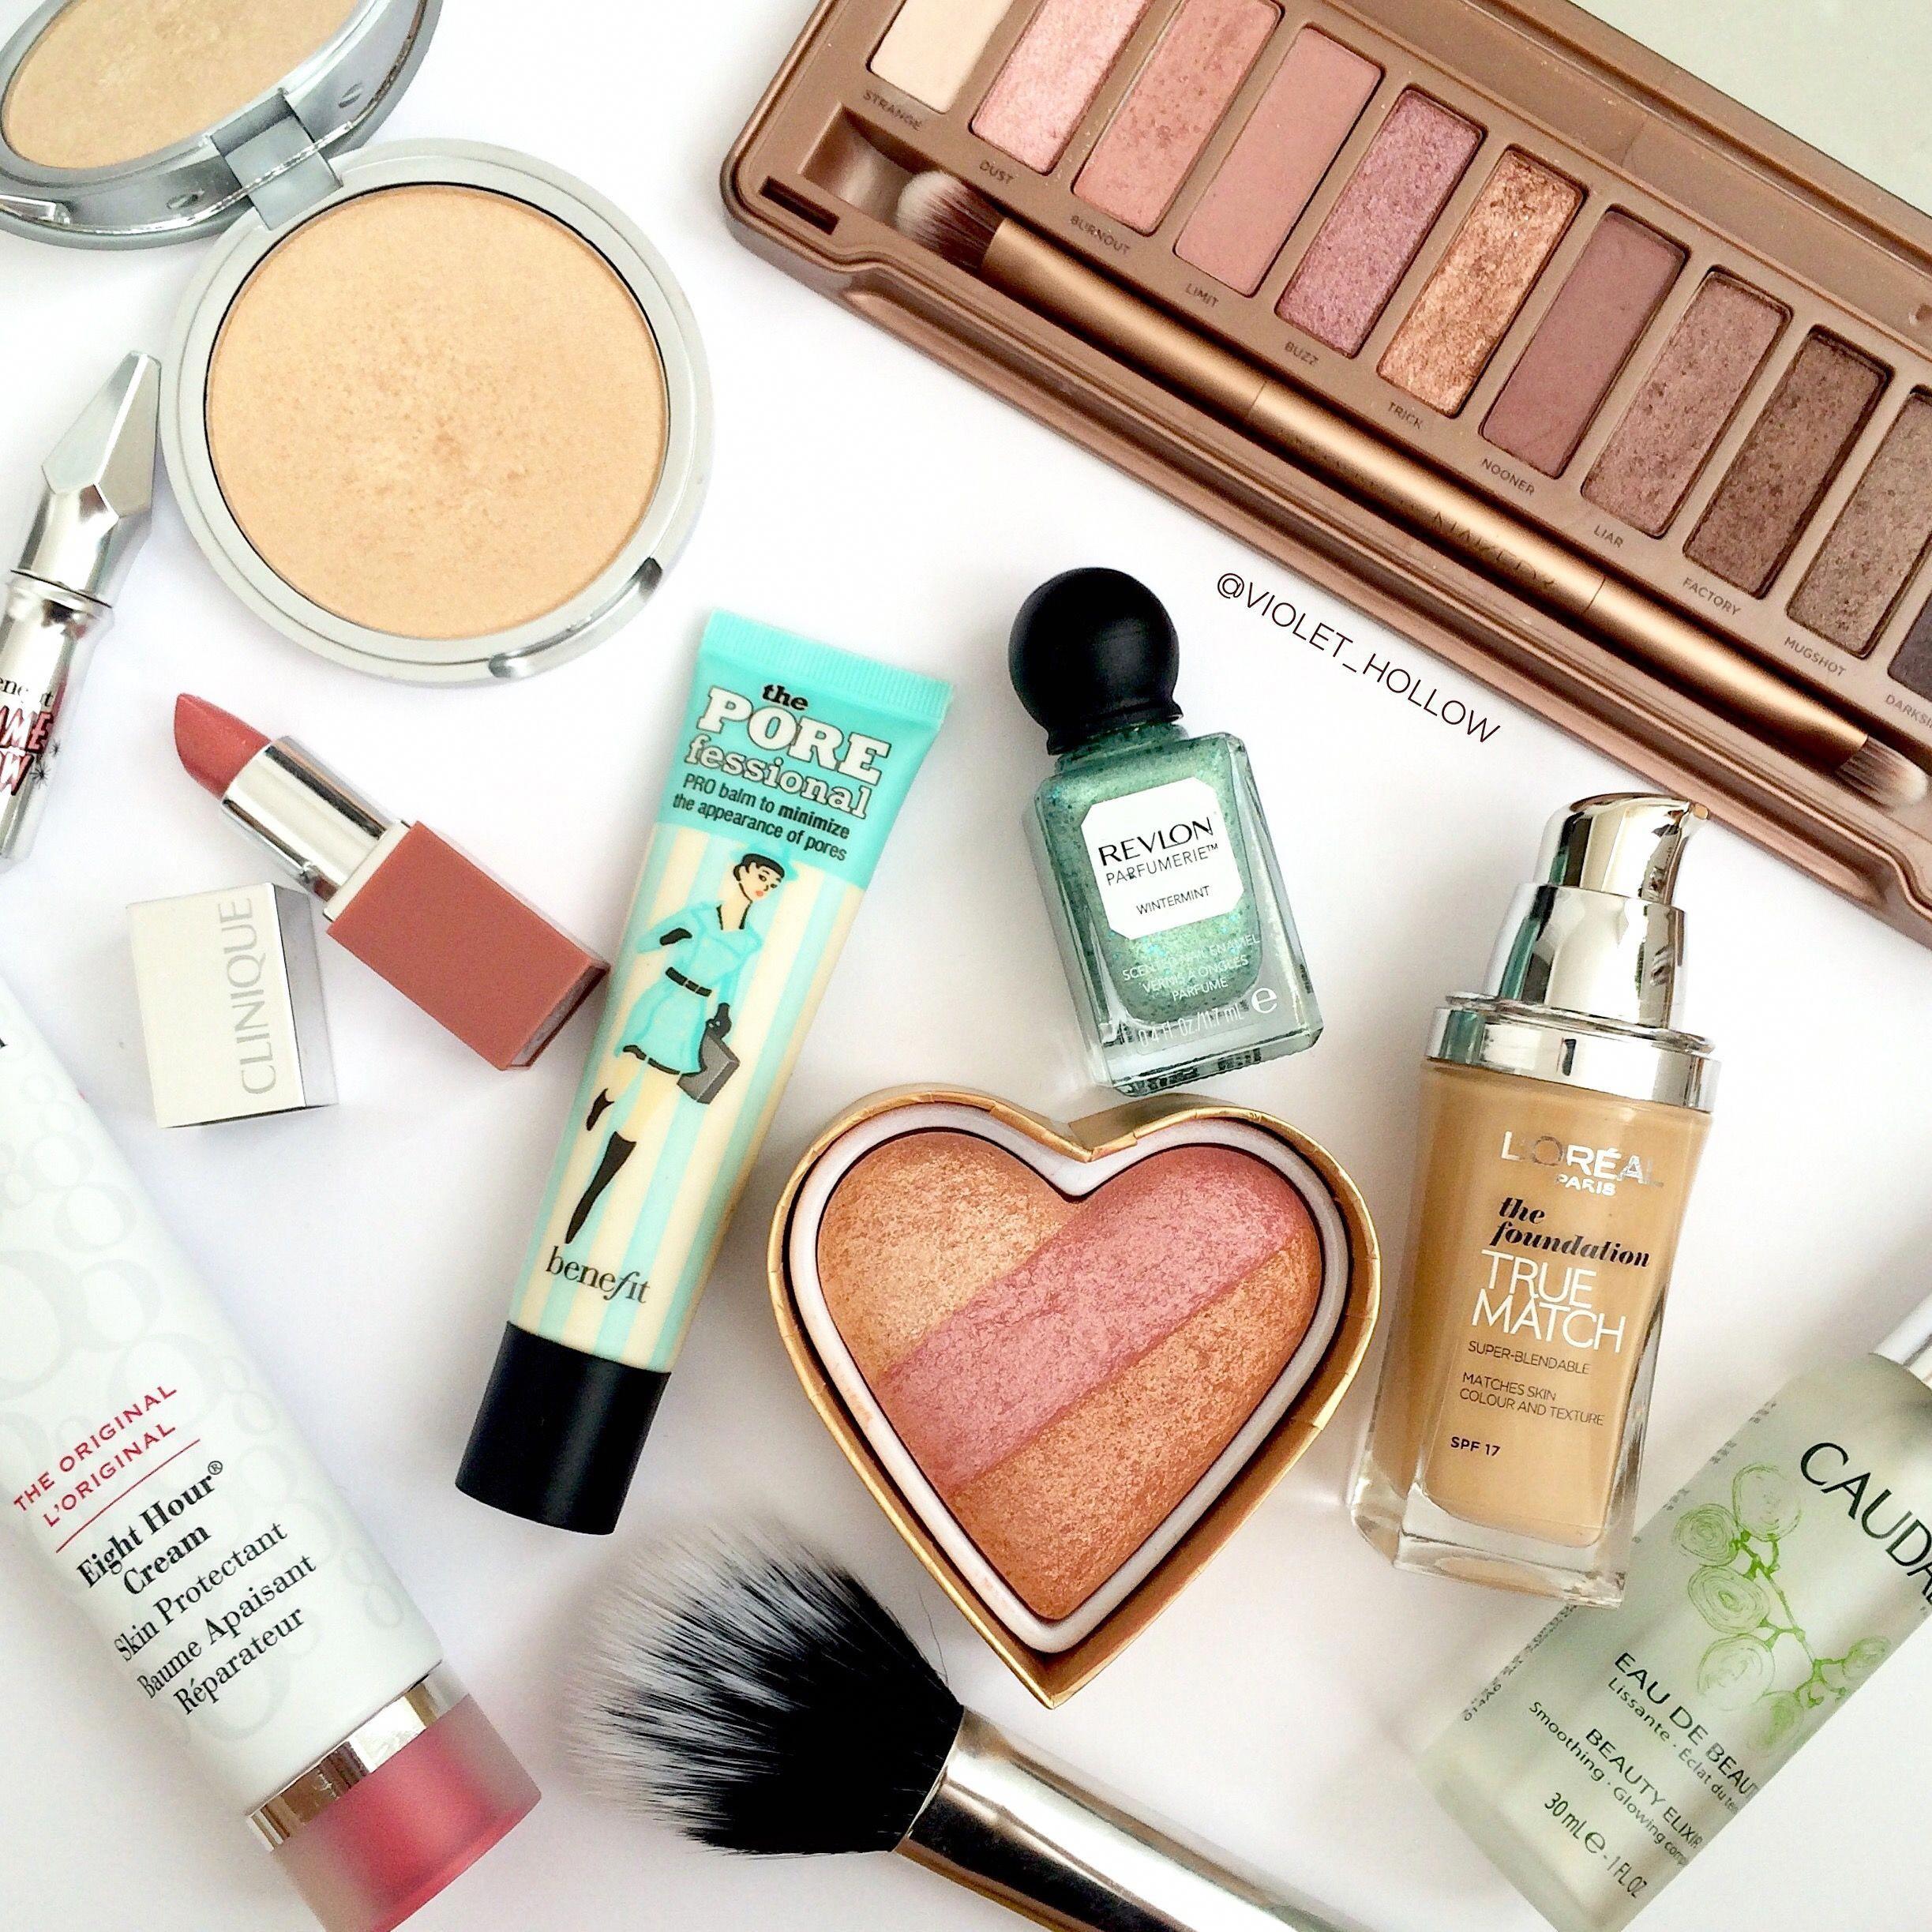 Makeup Geek James Charles.   Makeup brush kit, Kabuki ...